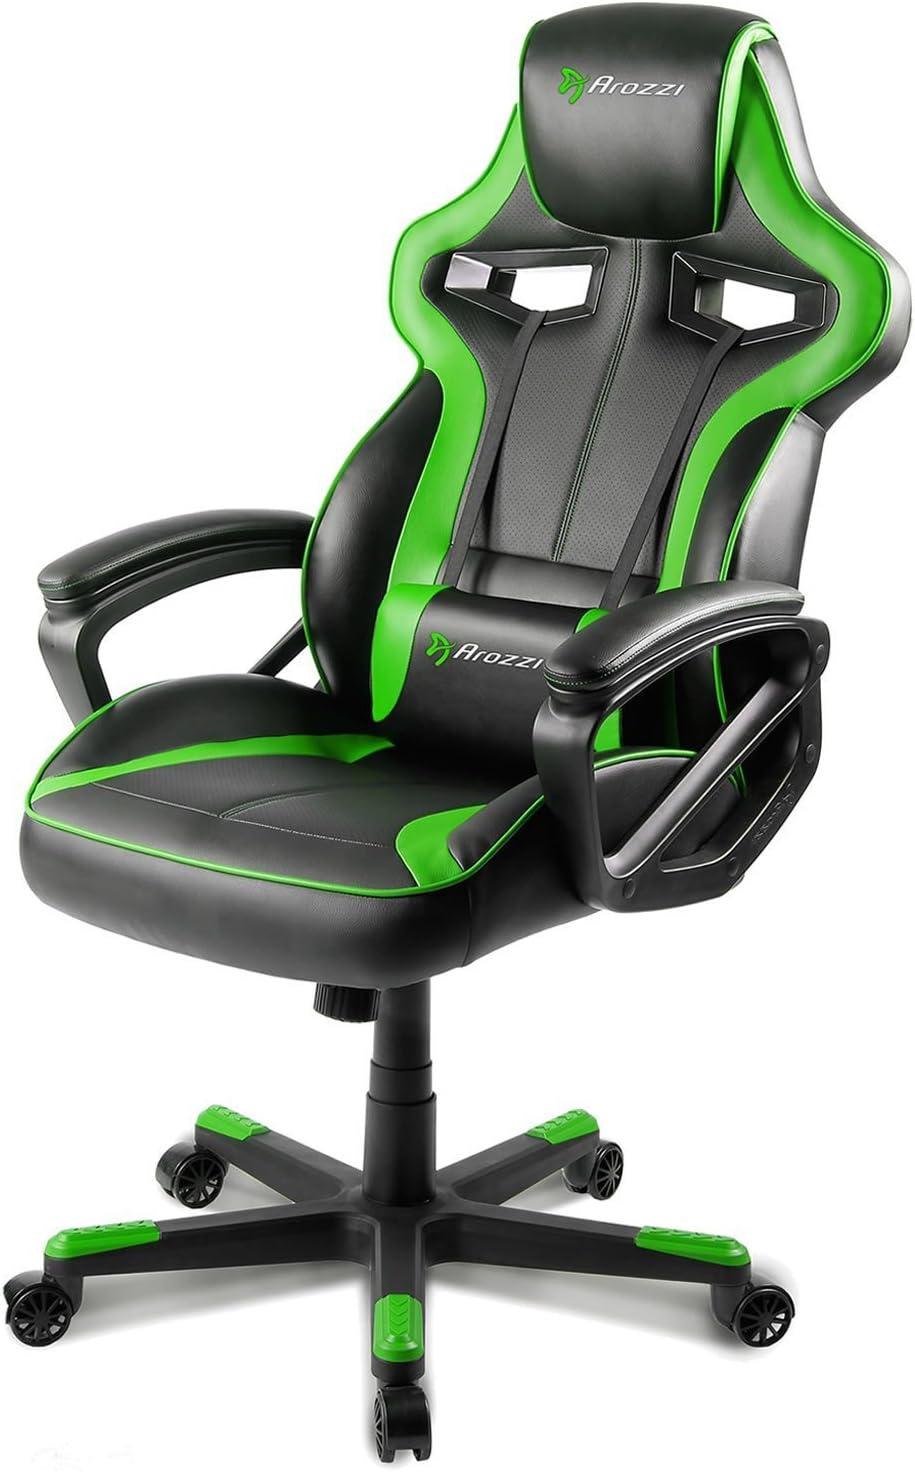 Arozzi Milano Enhanced Gaming Chair, Green